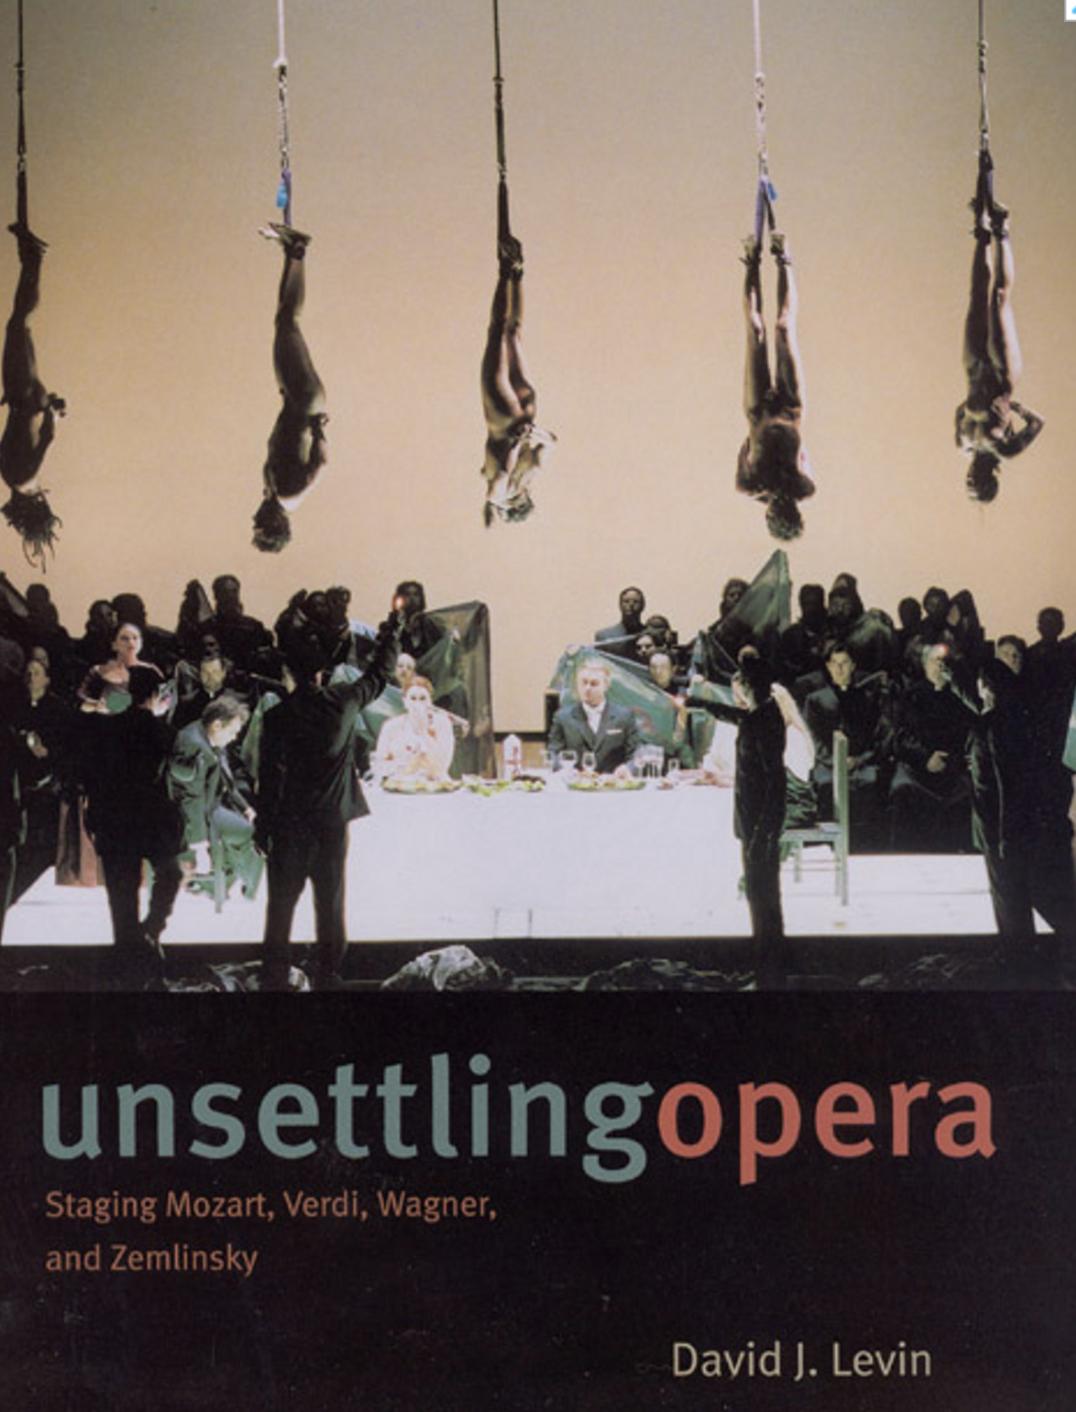 DL Unsettling Opera